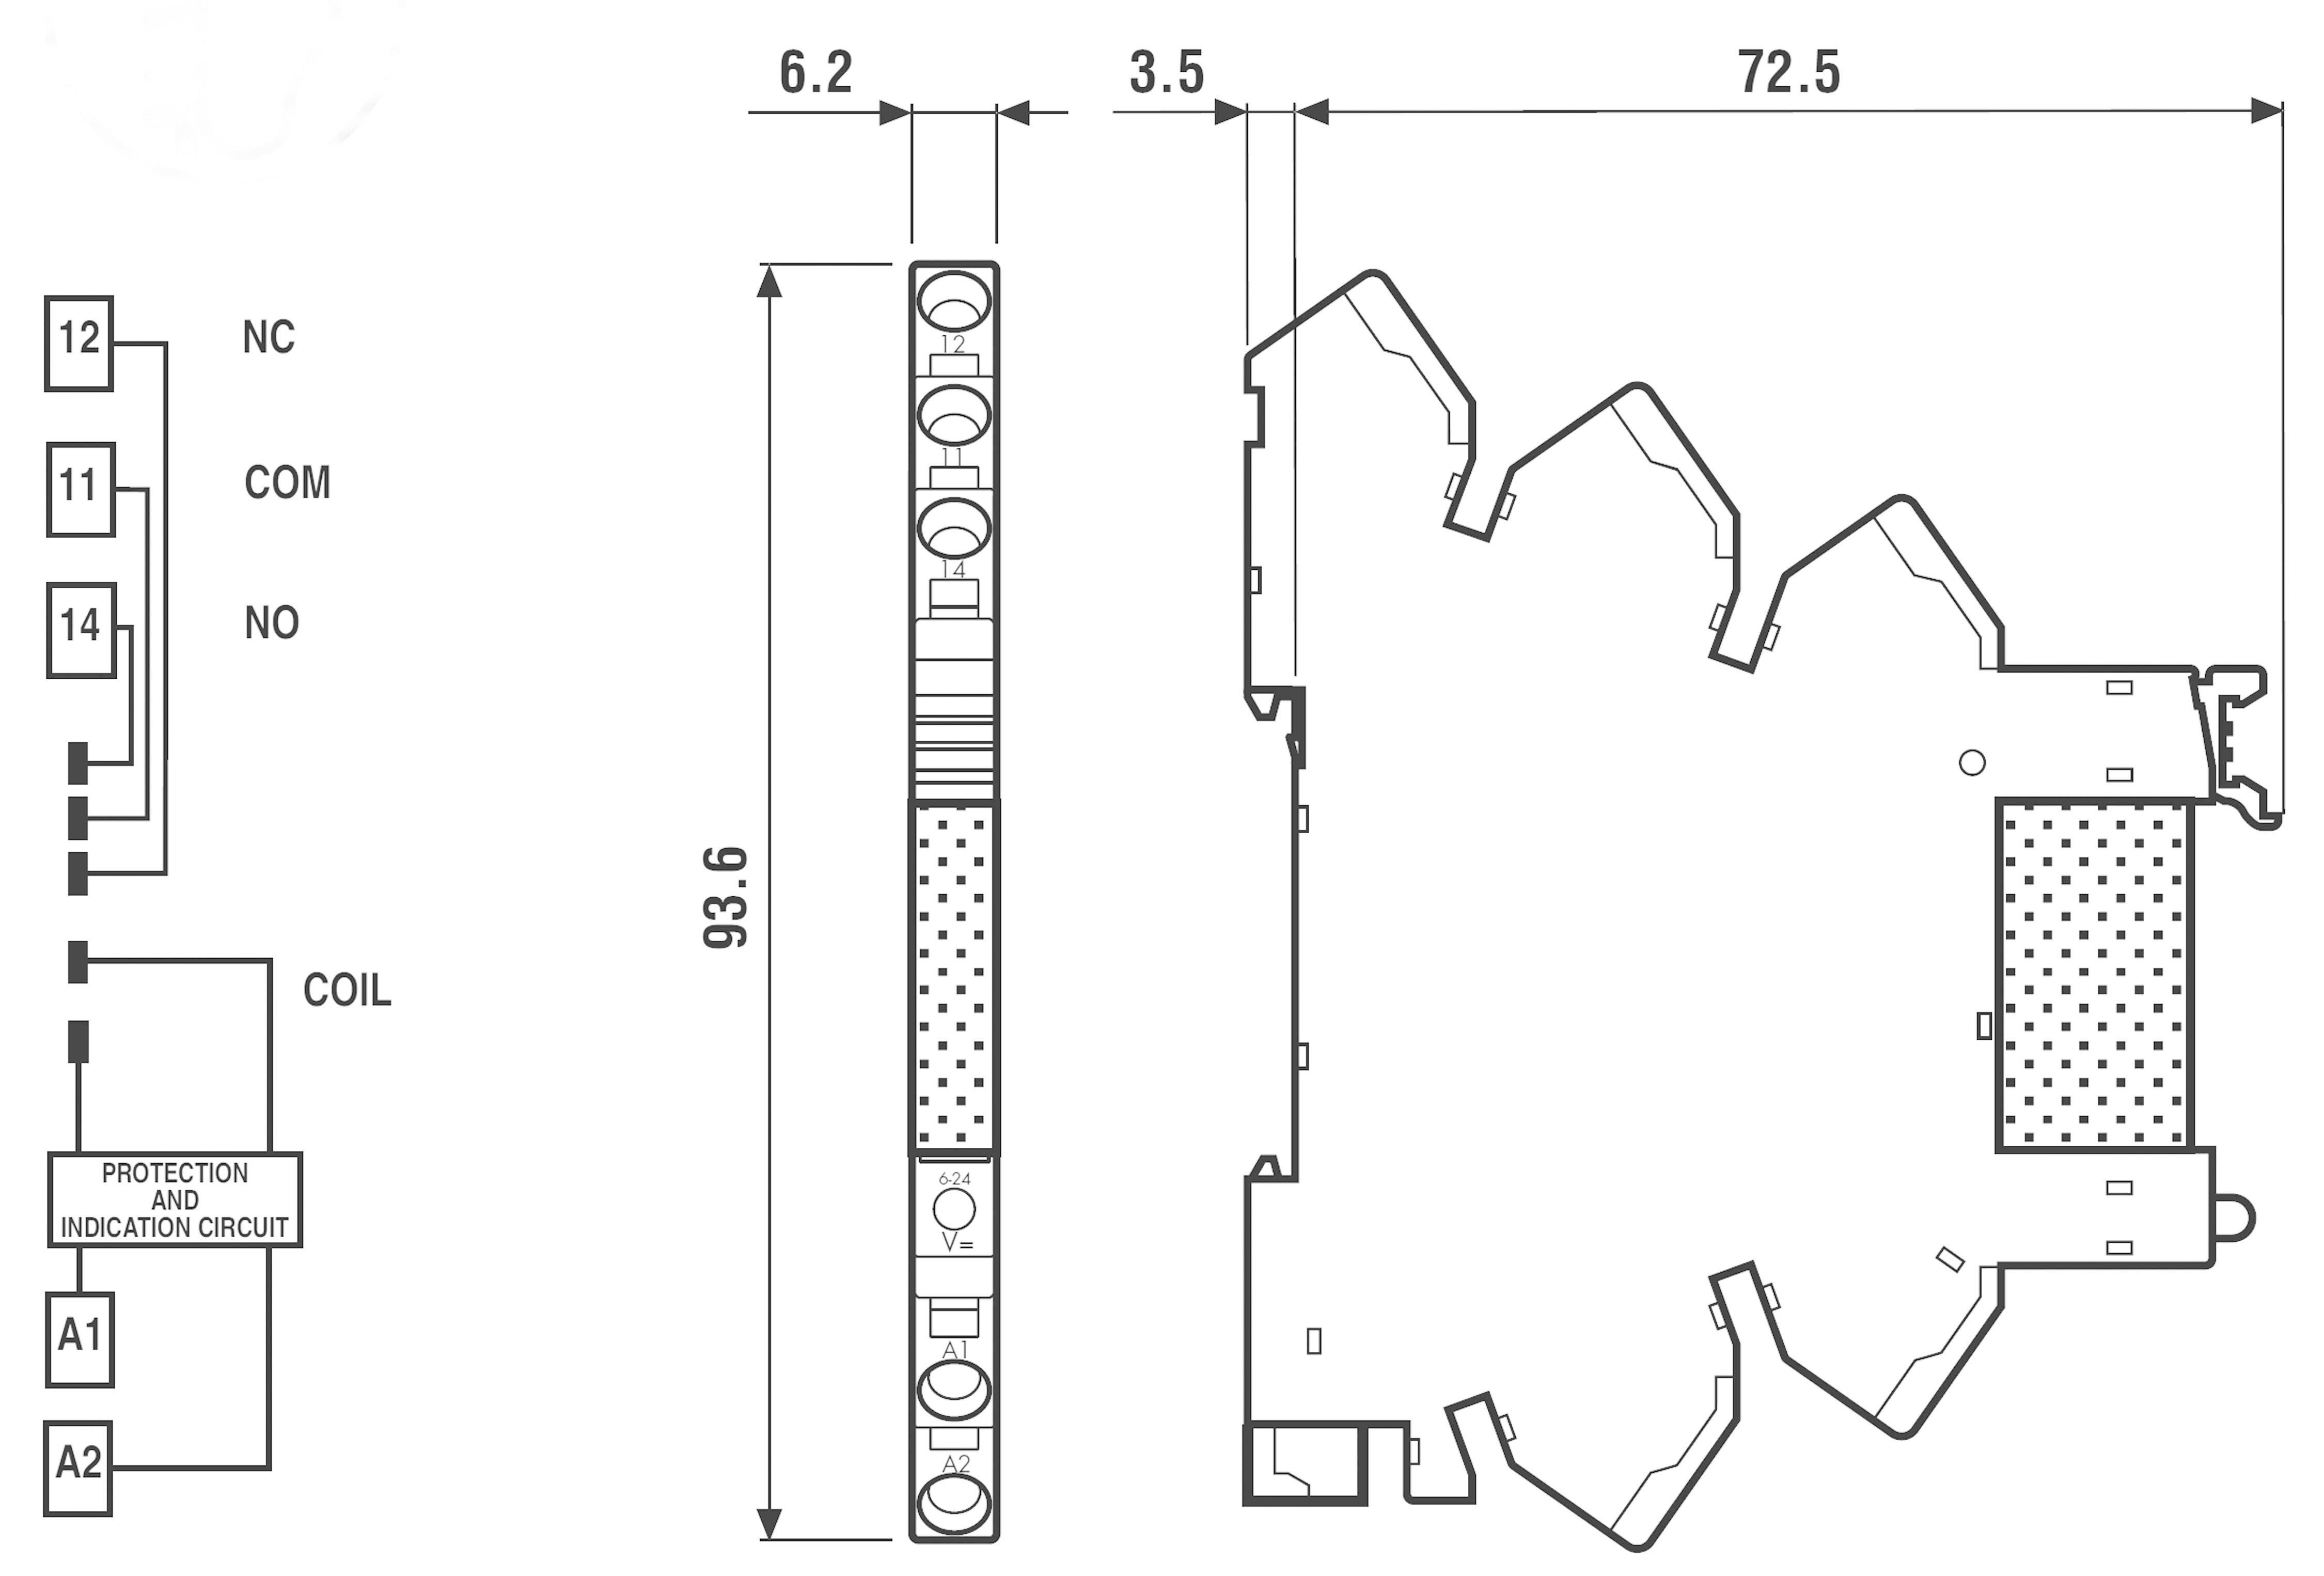 Interface relé Finder 38.61.0.024.0060, 24 V ACDC, 6 A, 6,2mm